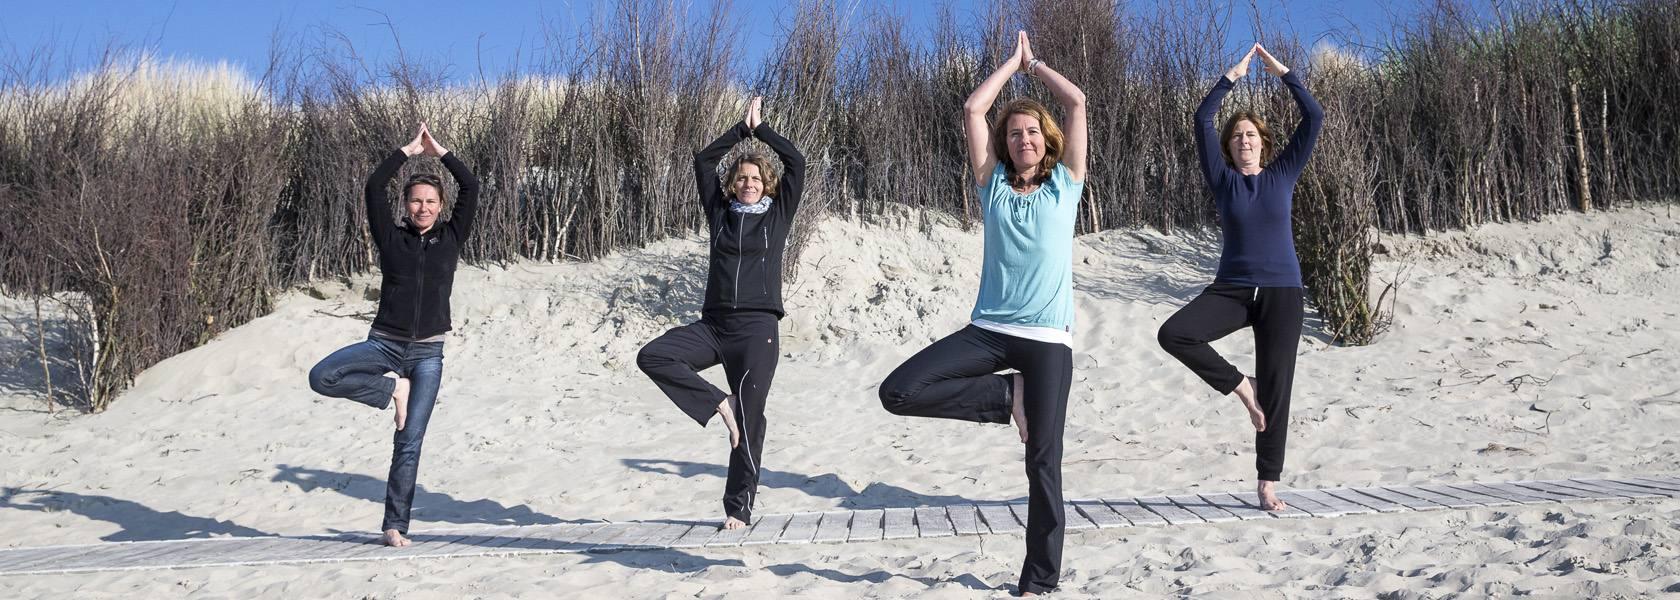 Yoga am Strand, © Martin Stöver